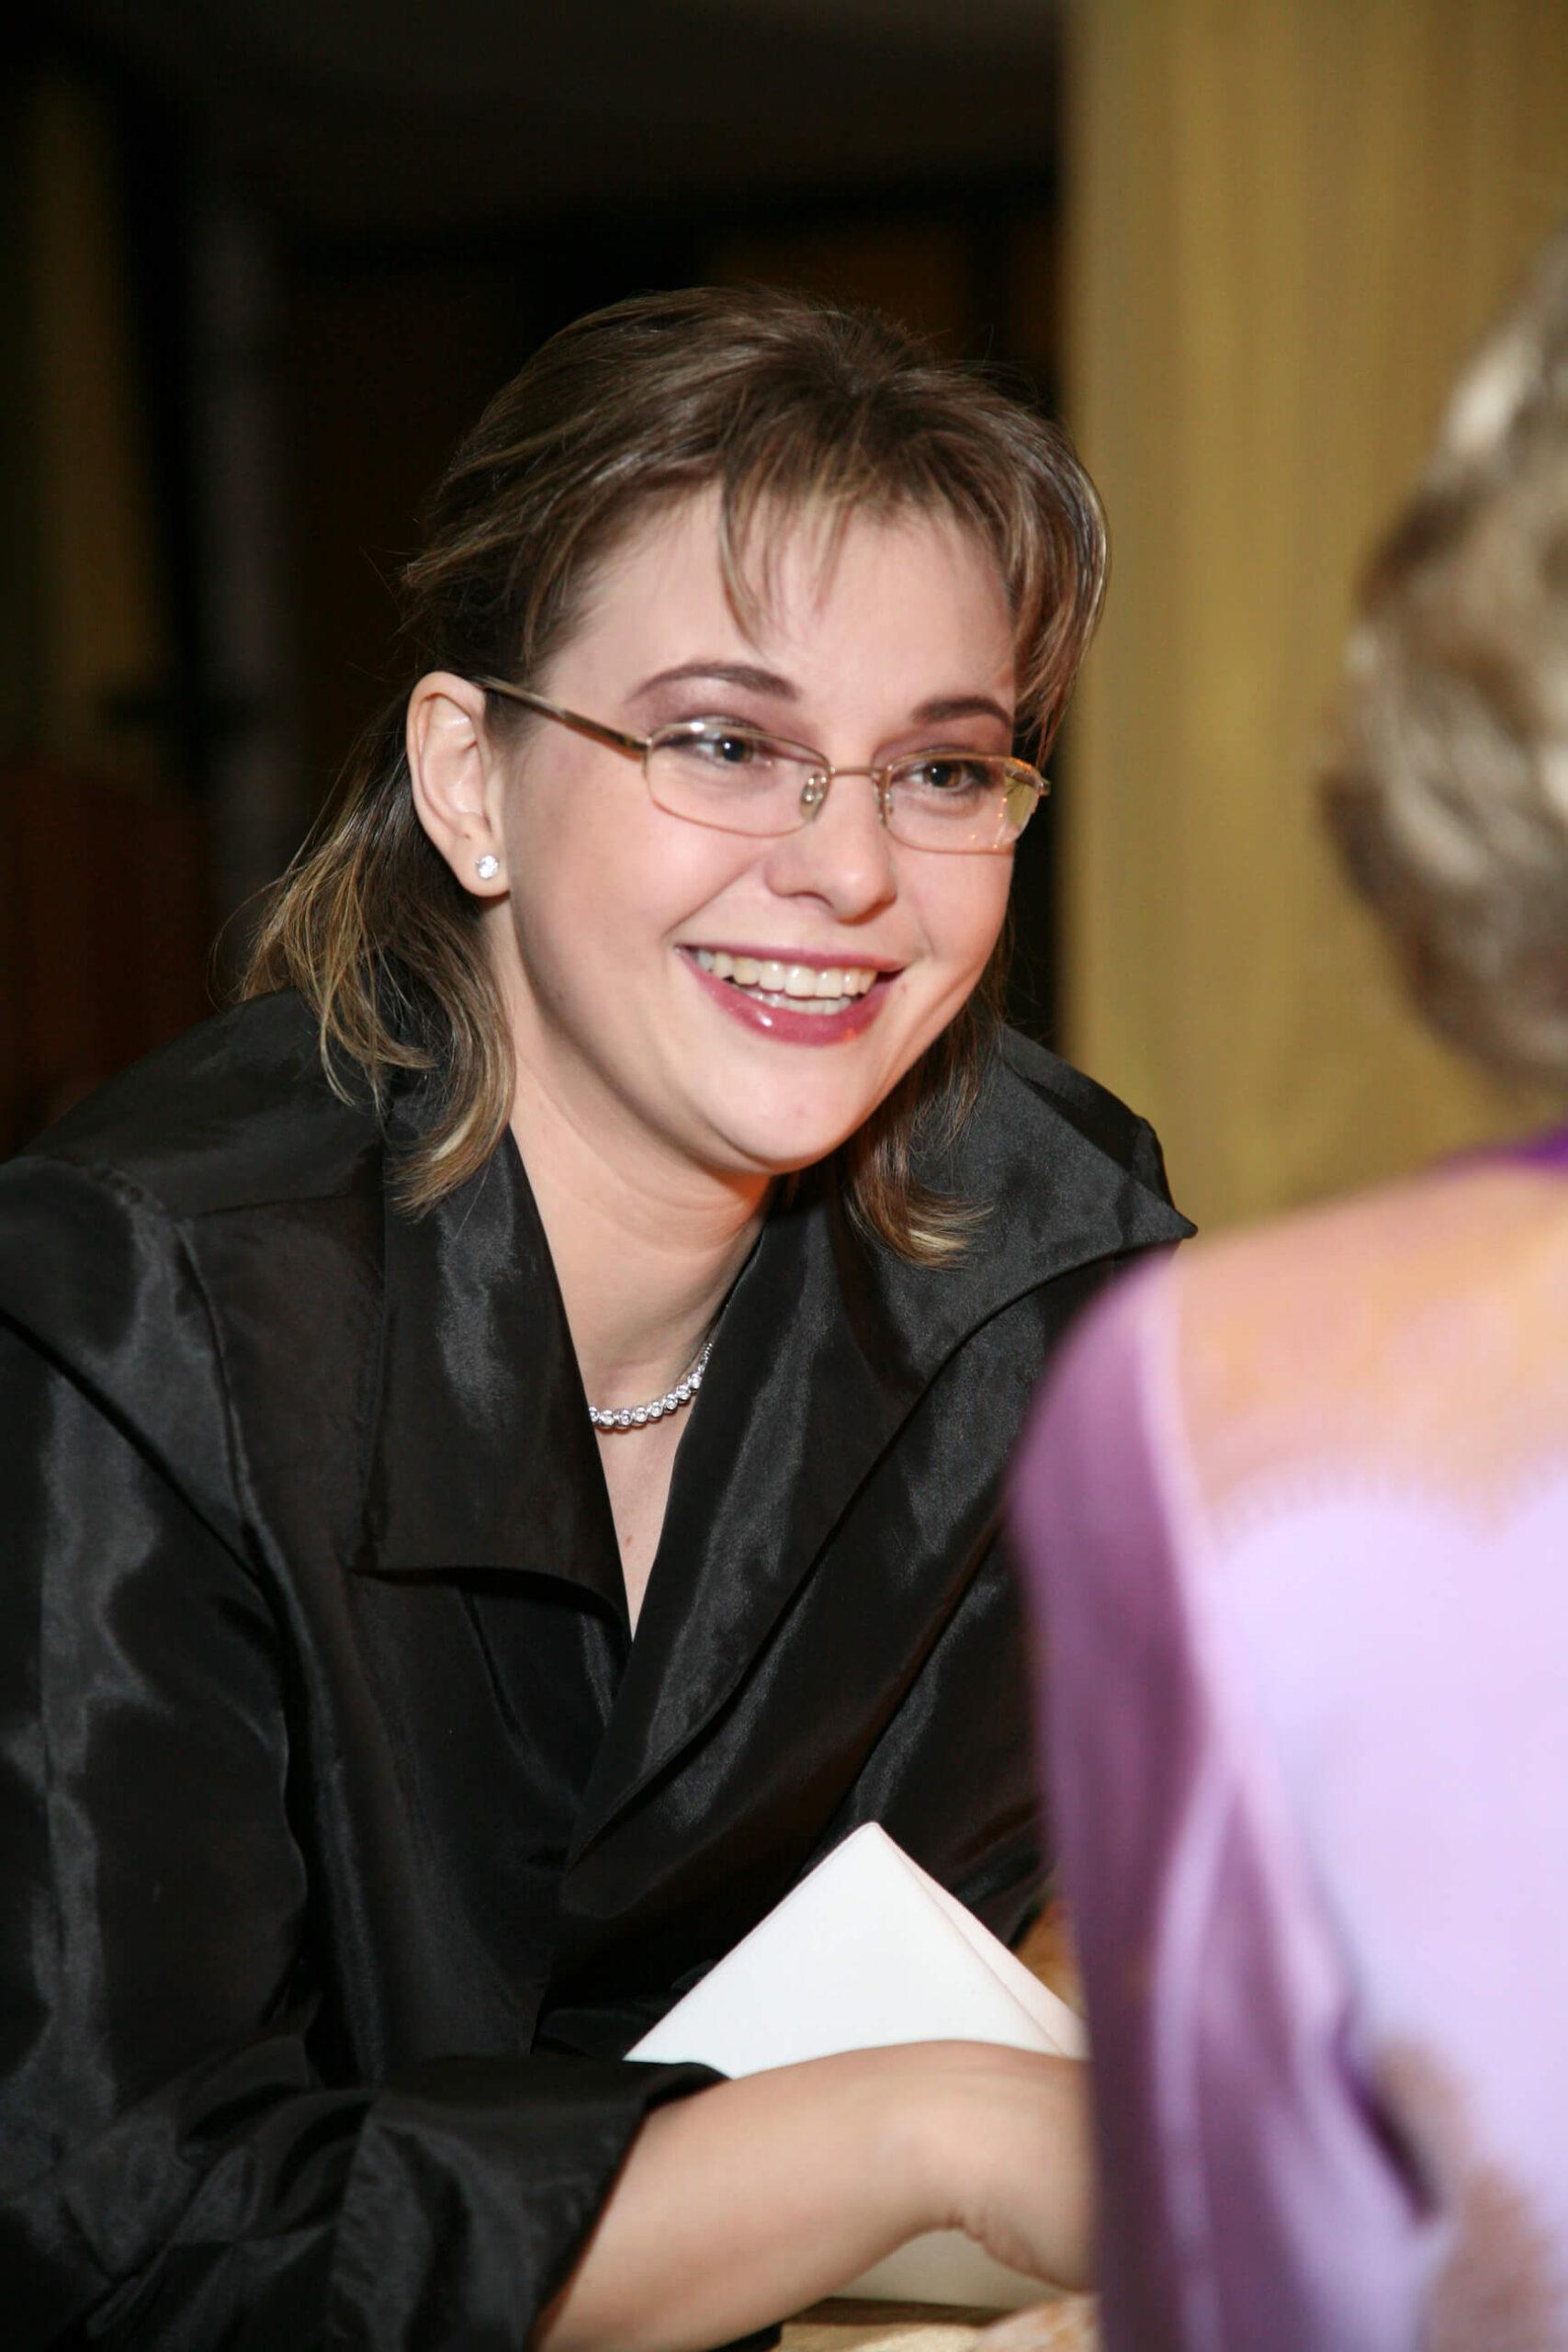 Ms. Éva Dúlfalvy violinist